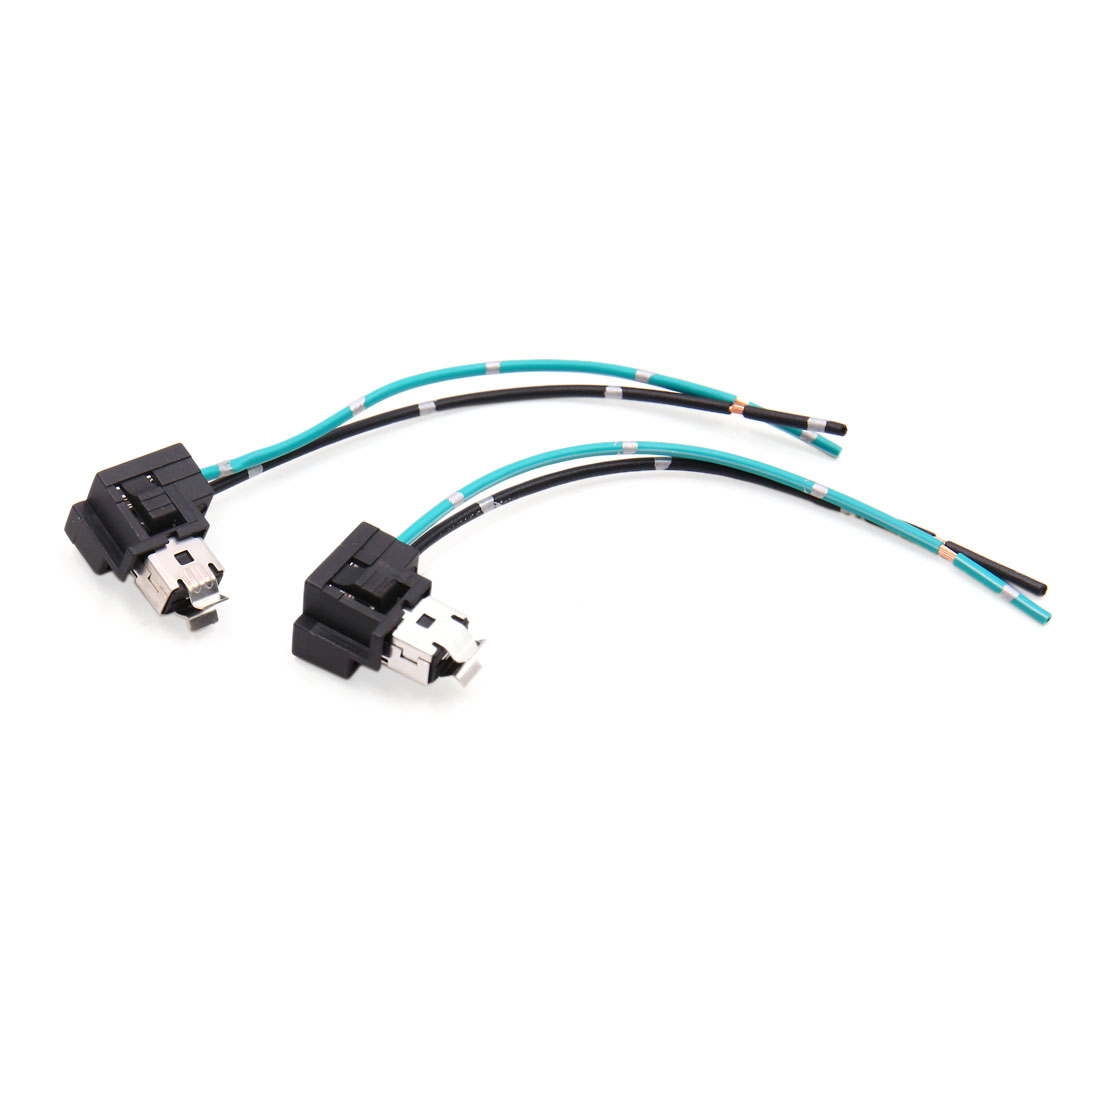 2pcs H1 Headlight Fog Lamp Extension Wiring Harness Socket